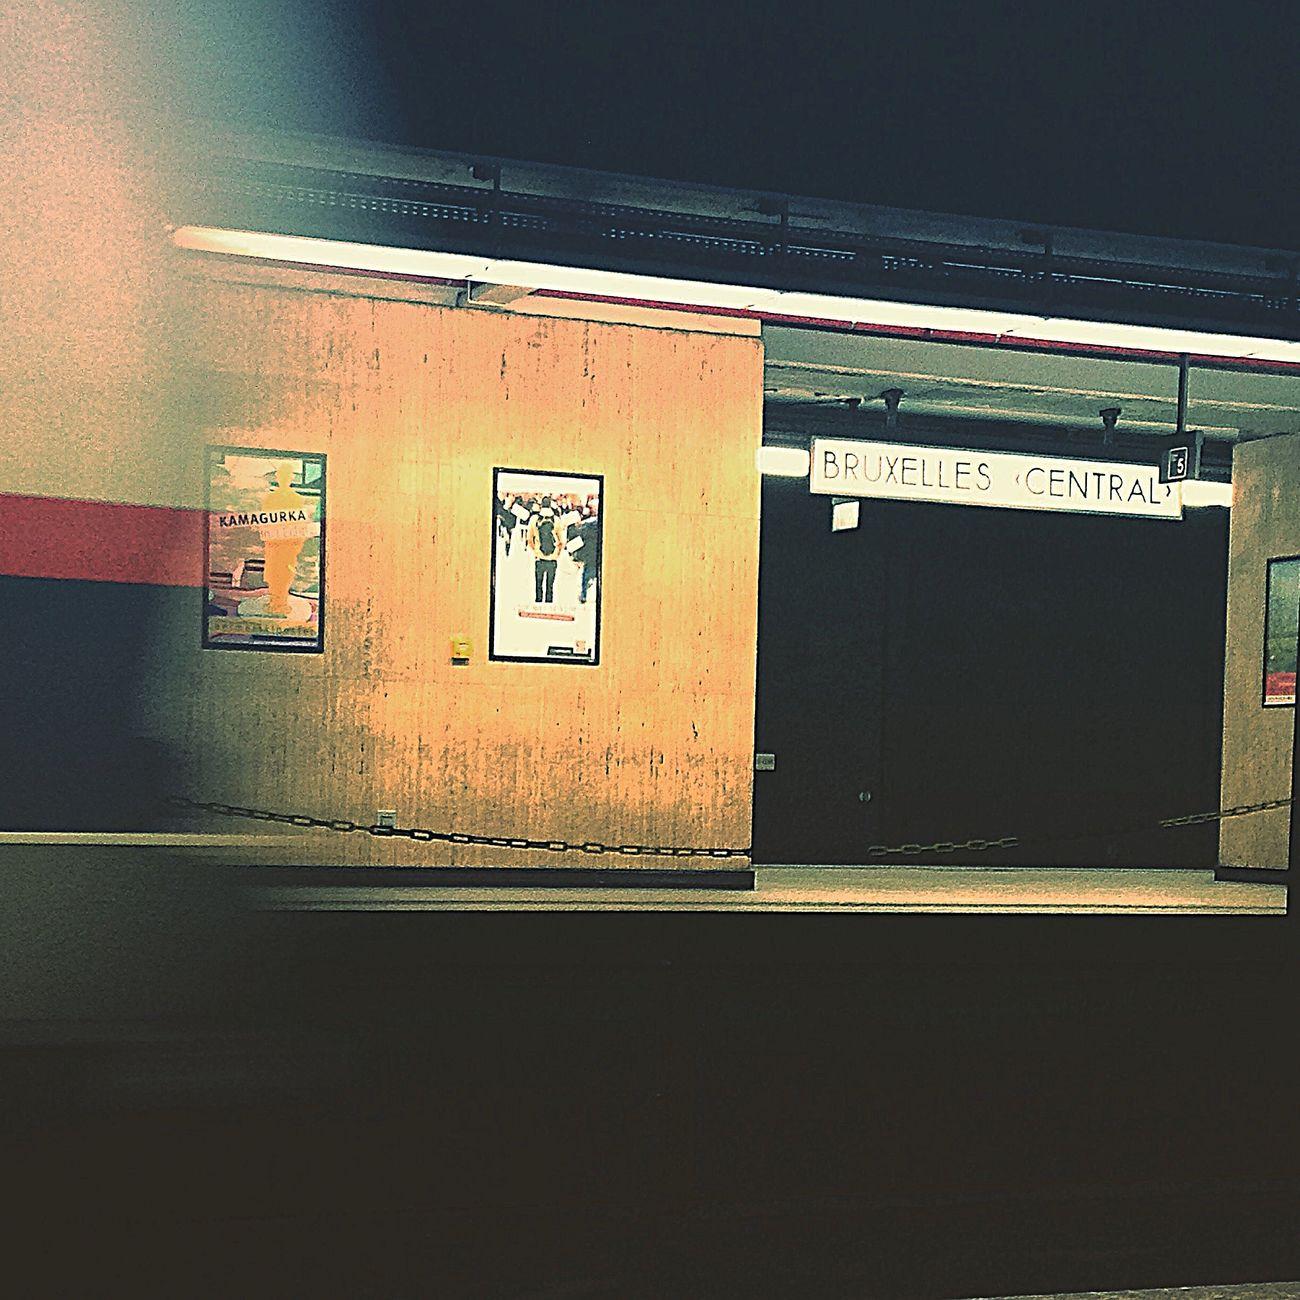 Bxl Brussels Trainstation Train